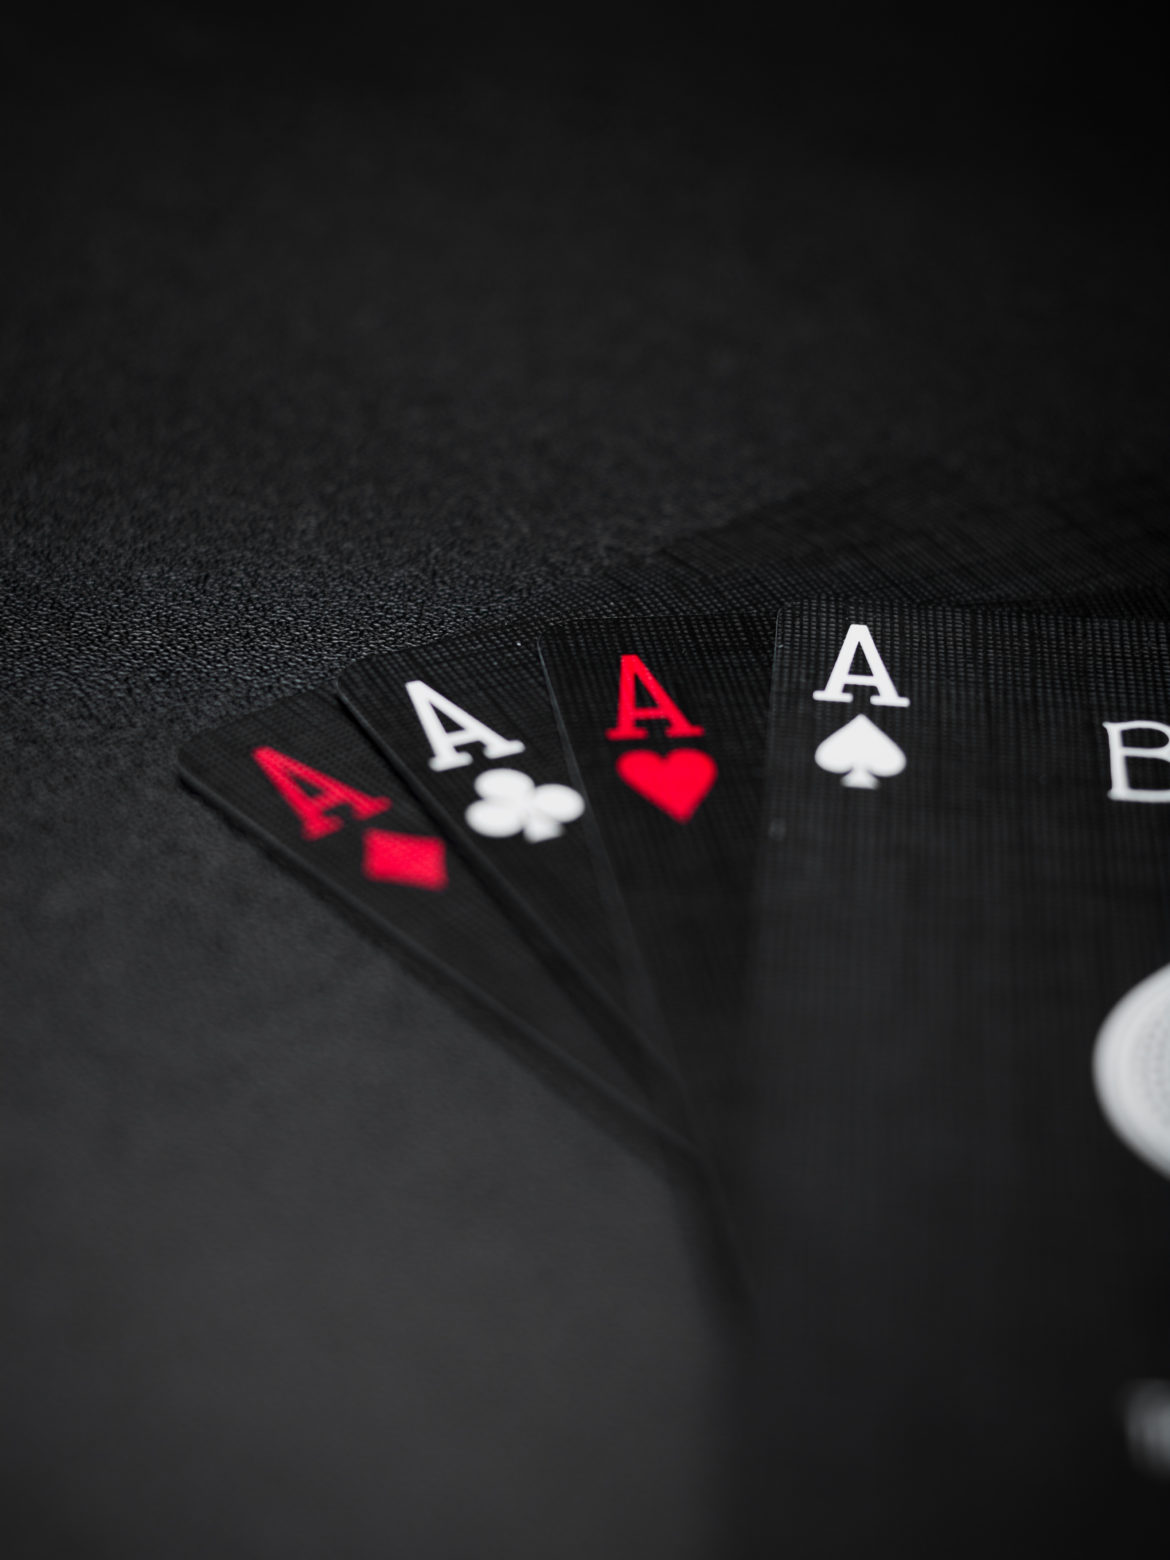 casino med spellicens